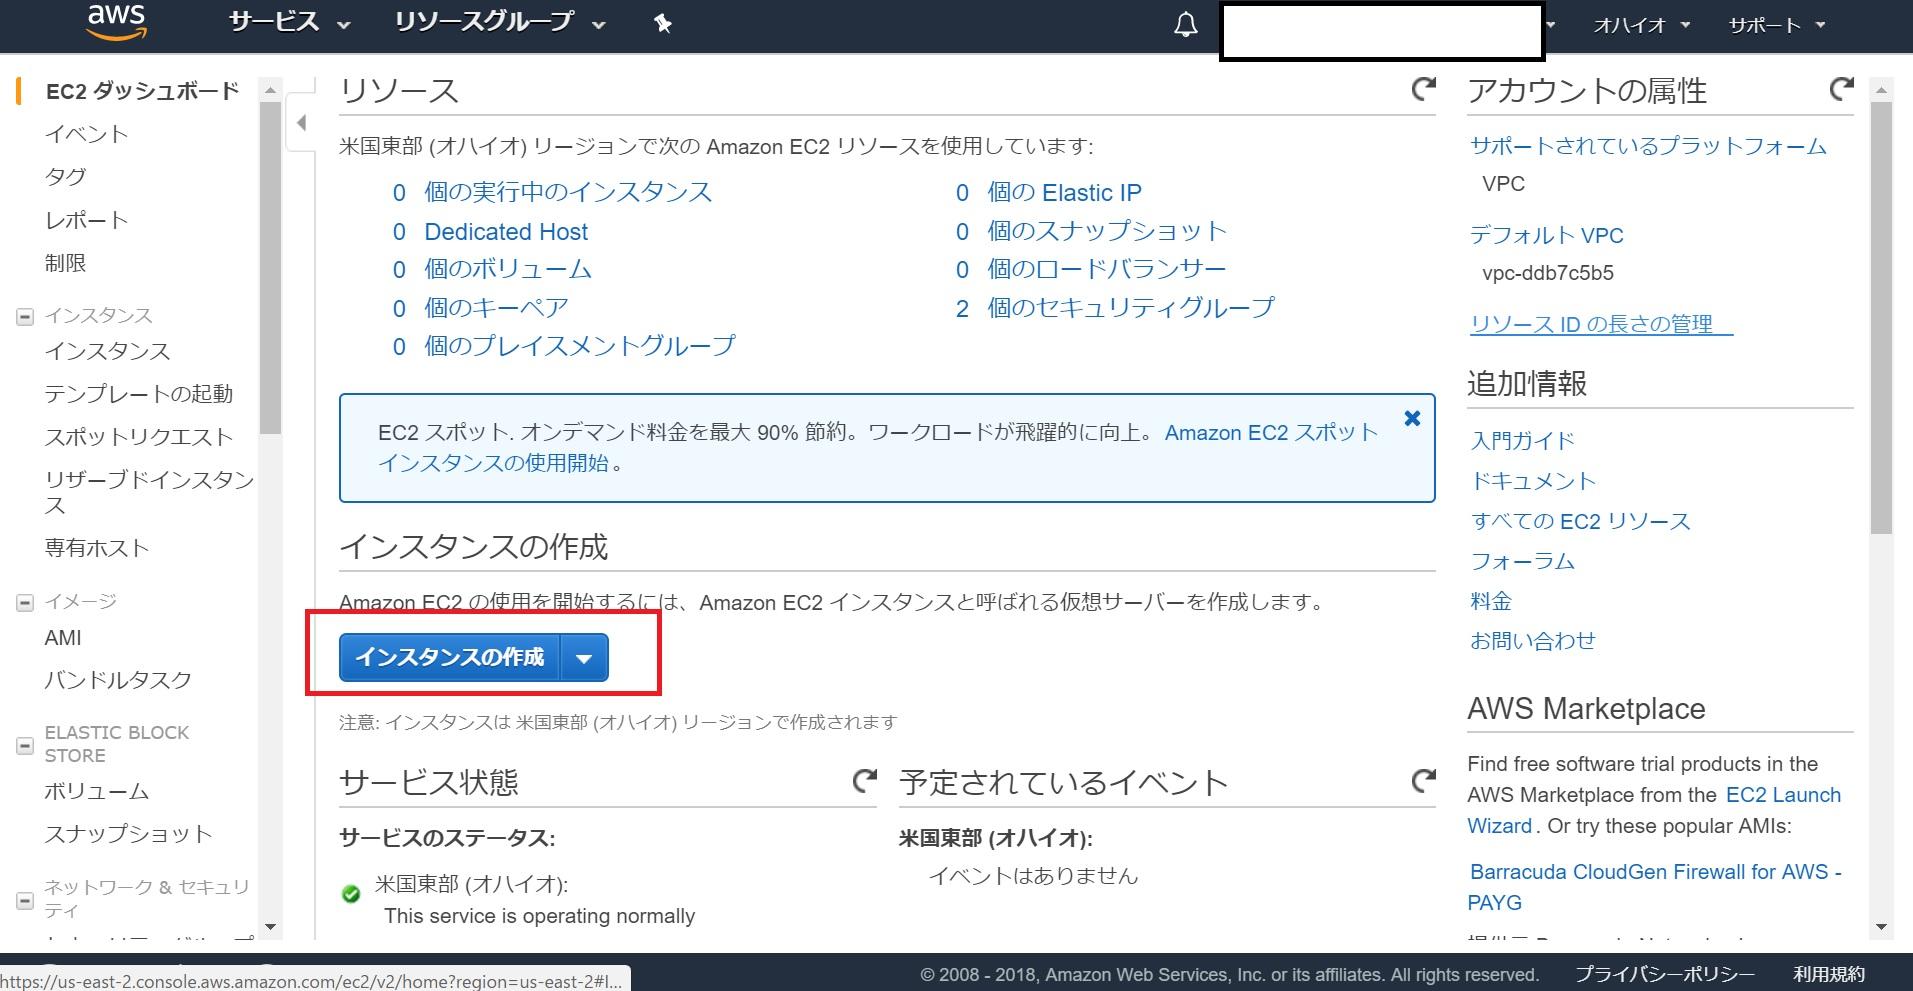 01_EC2トップ.jpg